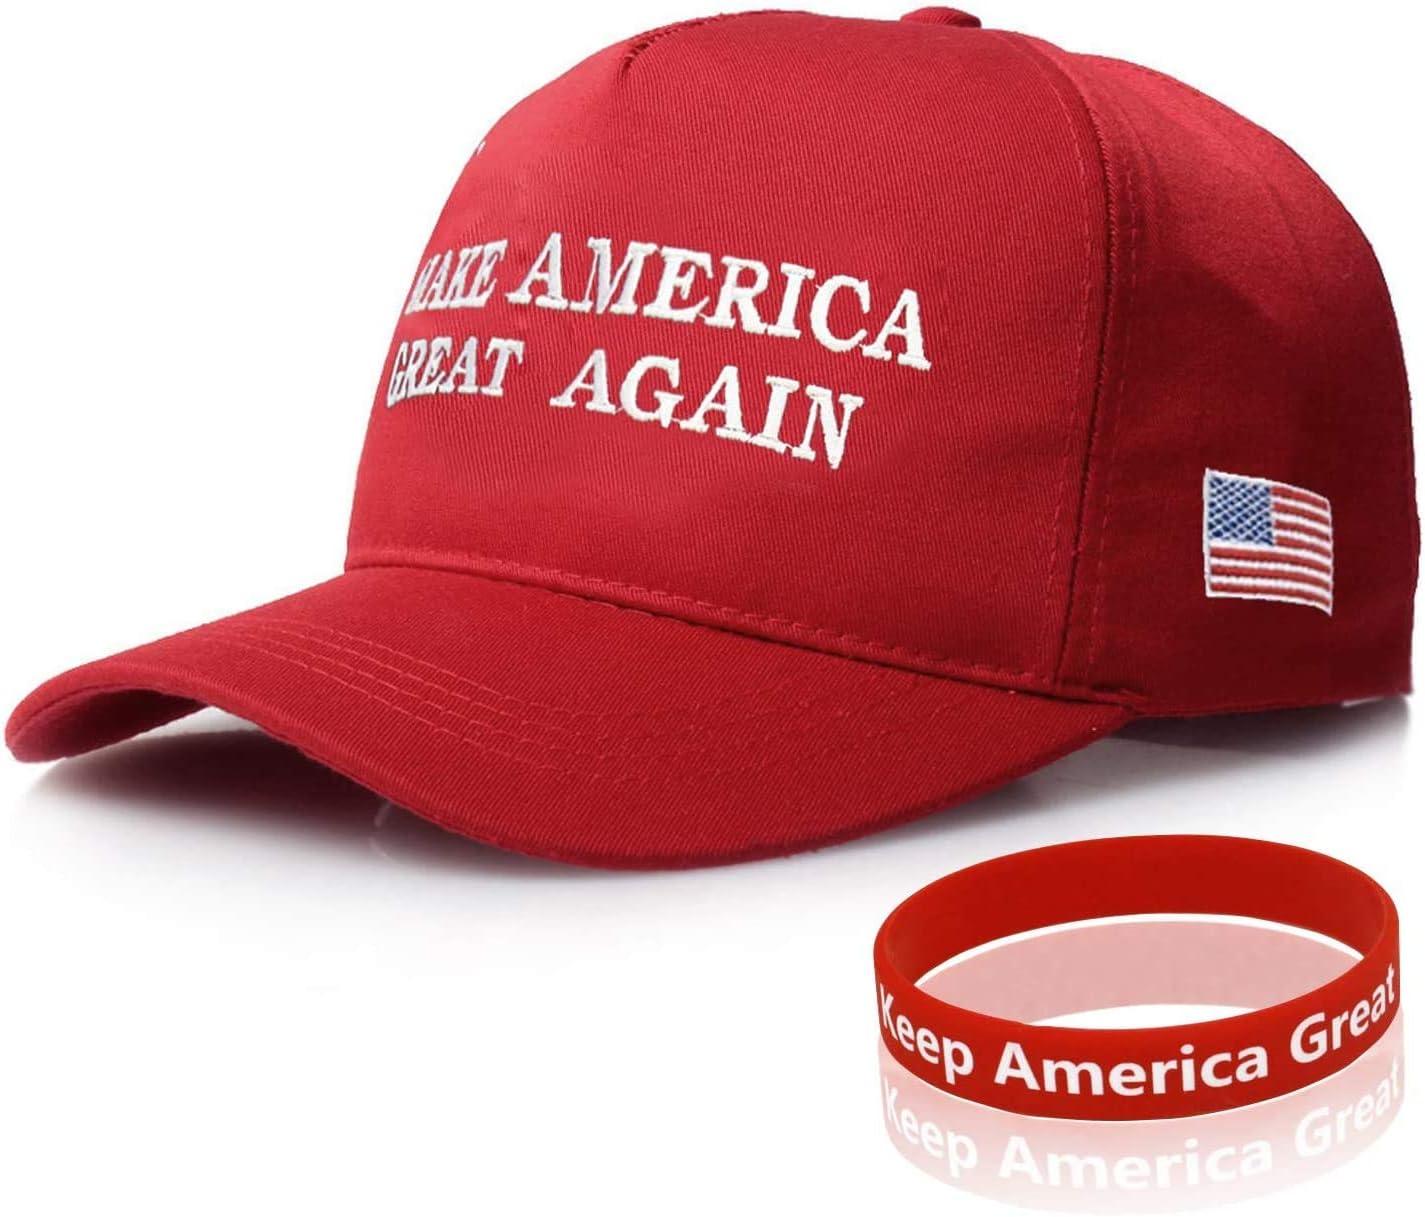 Cap New Make America Great Again Hat Donald Trump 2016 Republican Hat